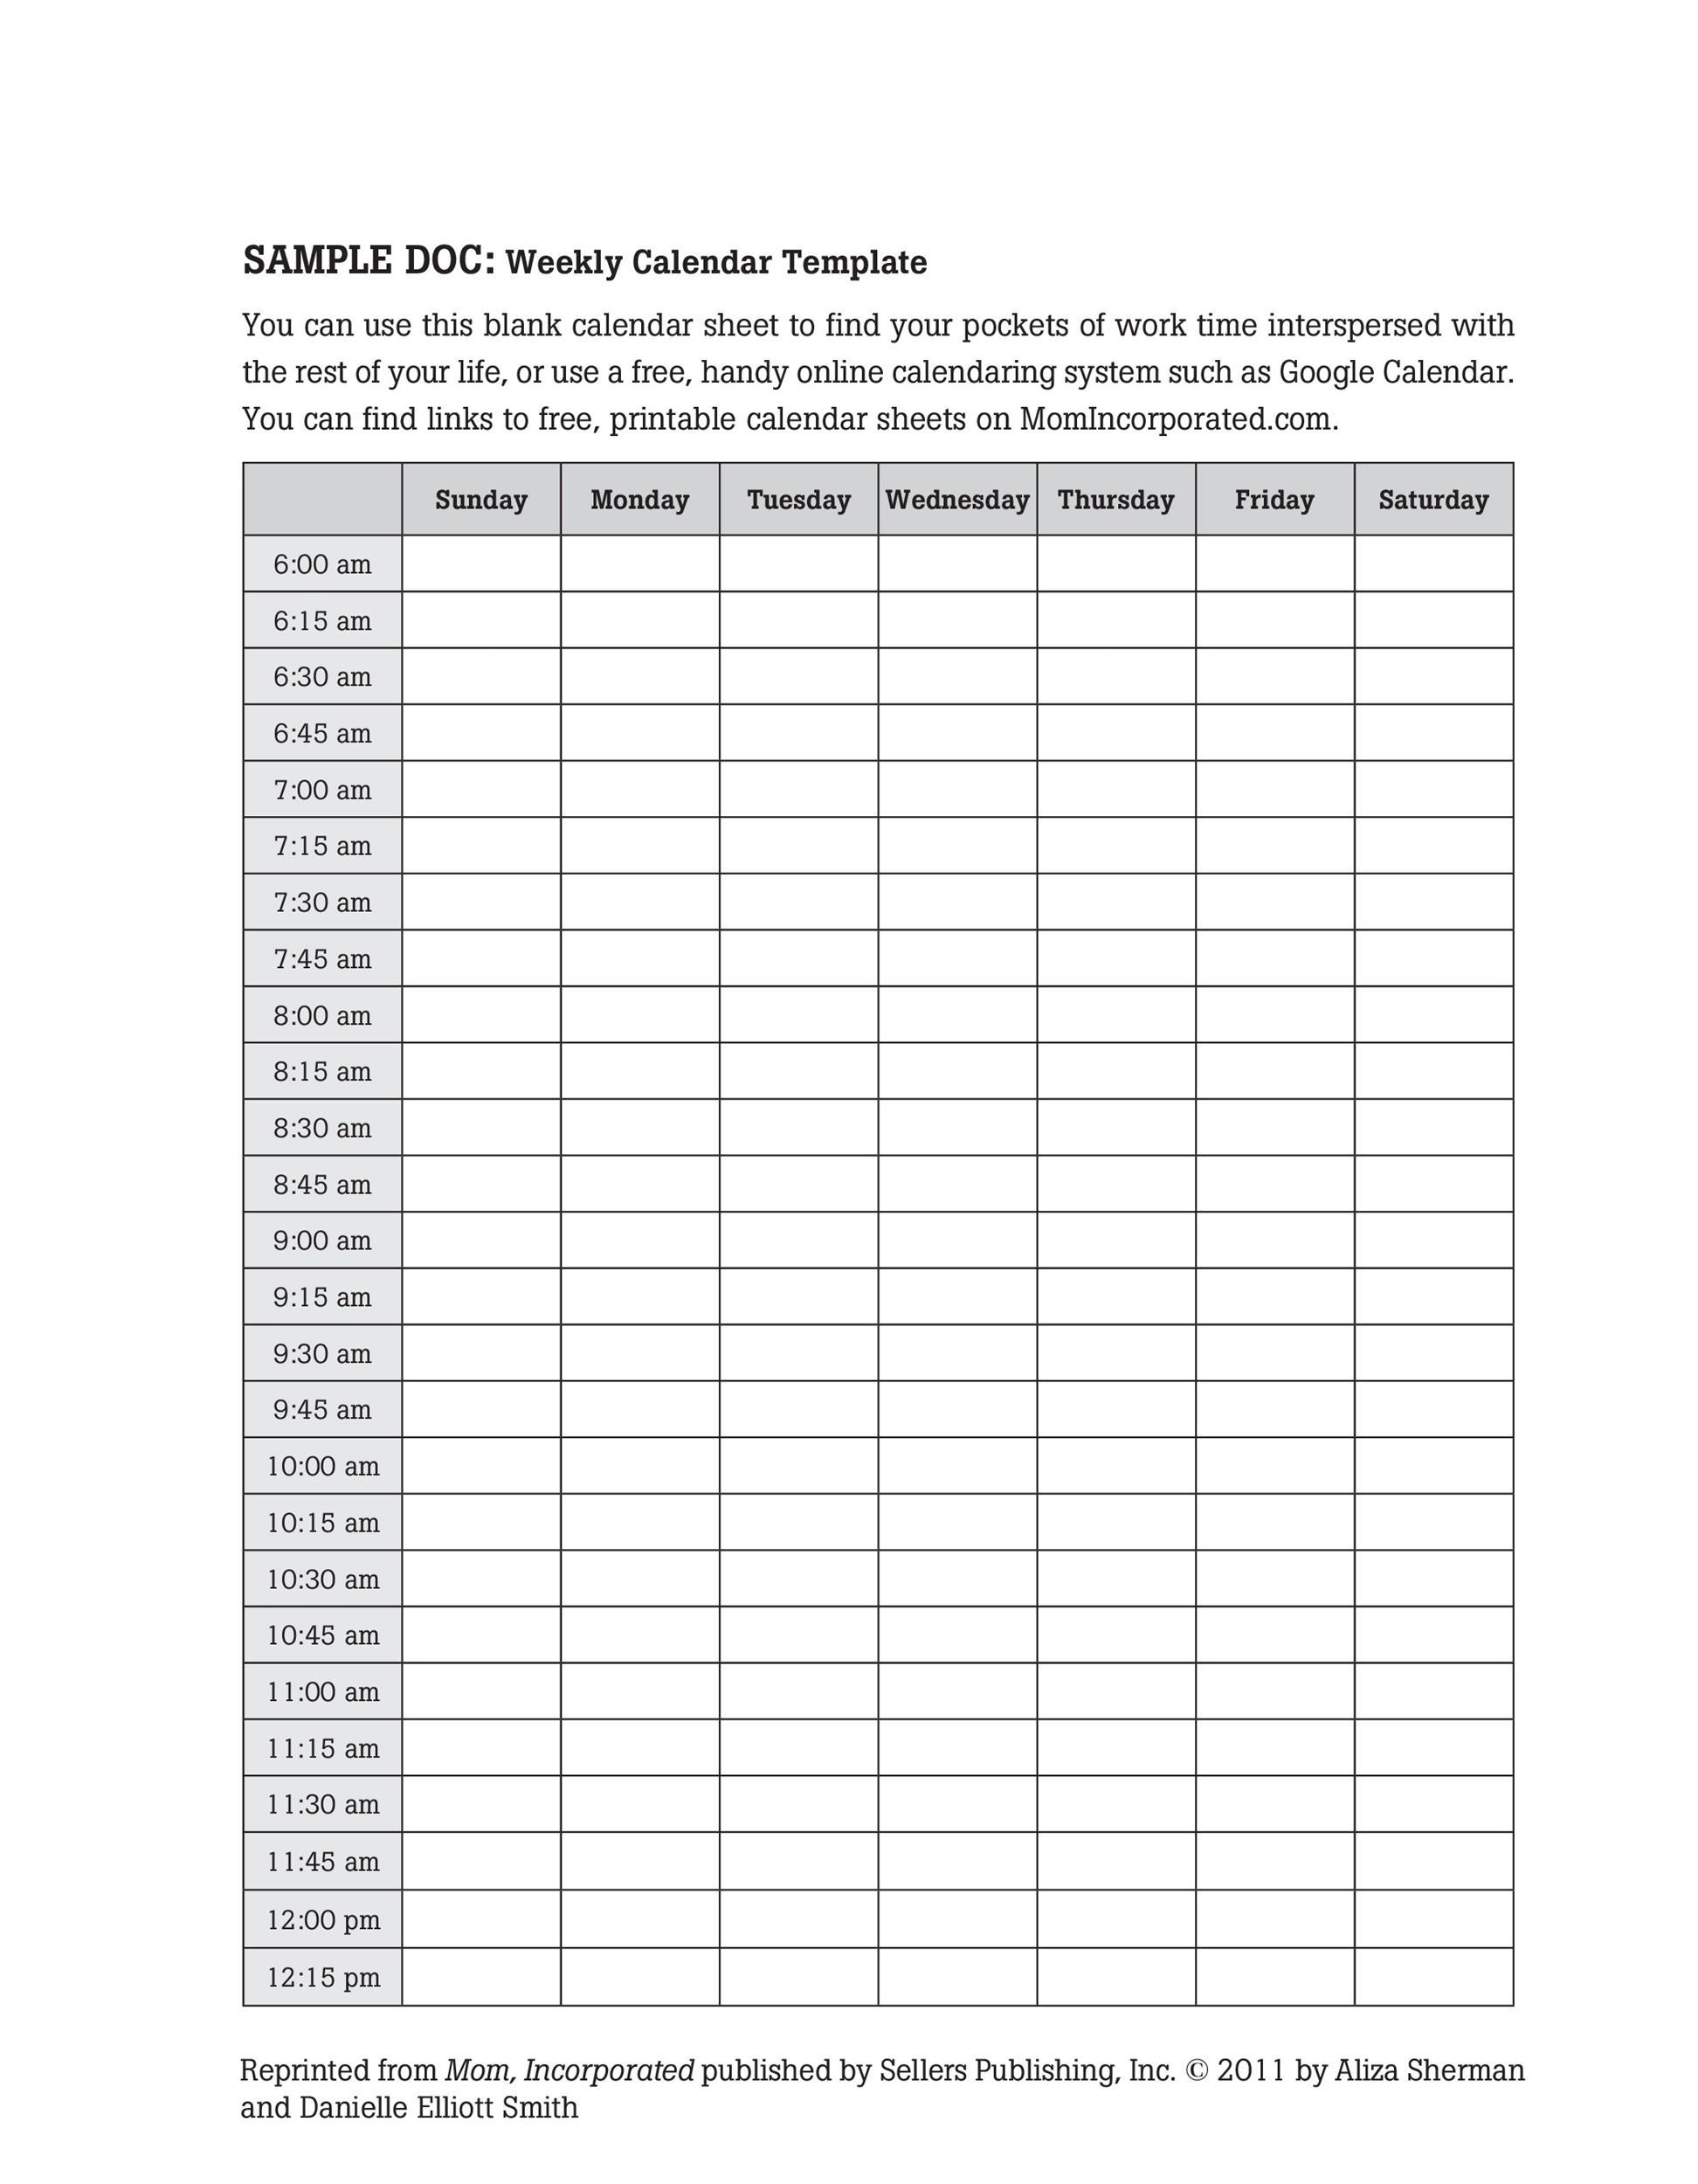 26 Blank Weekly Calendar Templates [Pdf, Excel, Word] - Template Lab